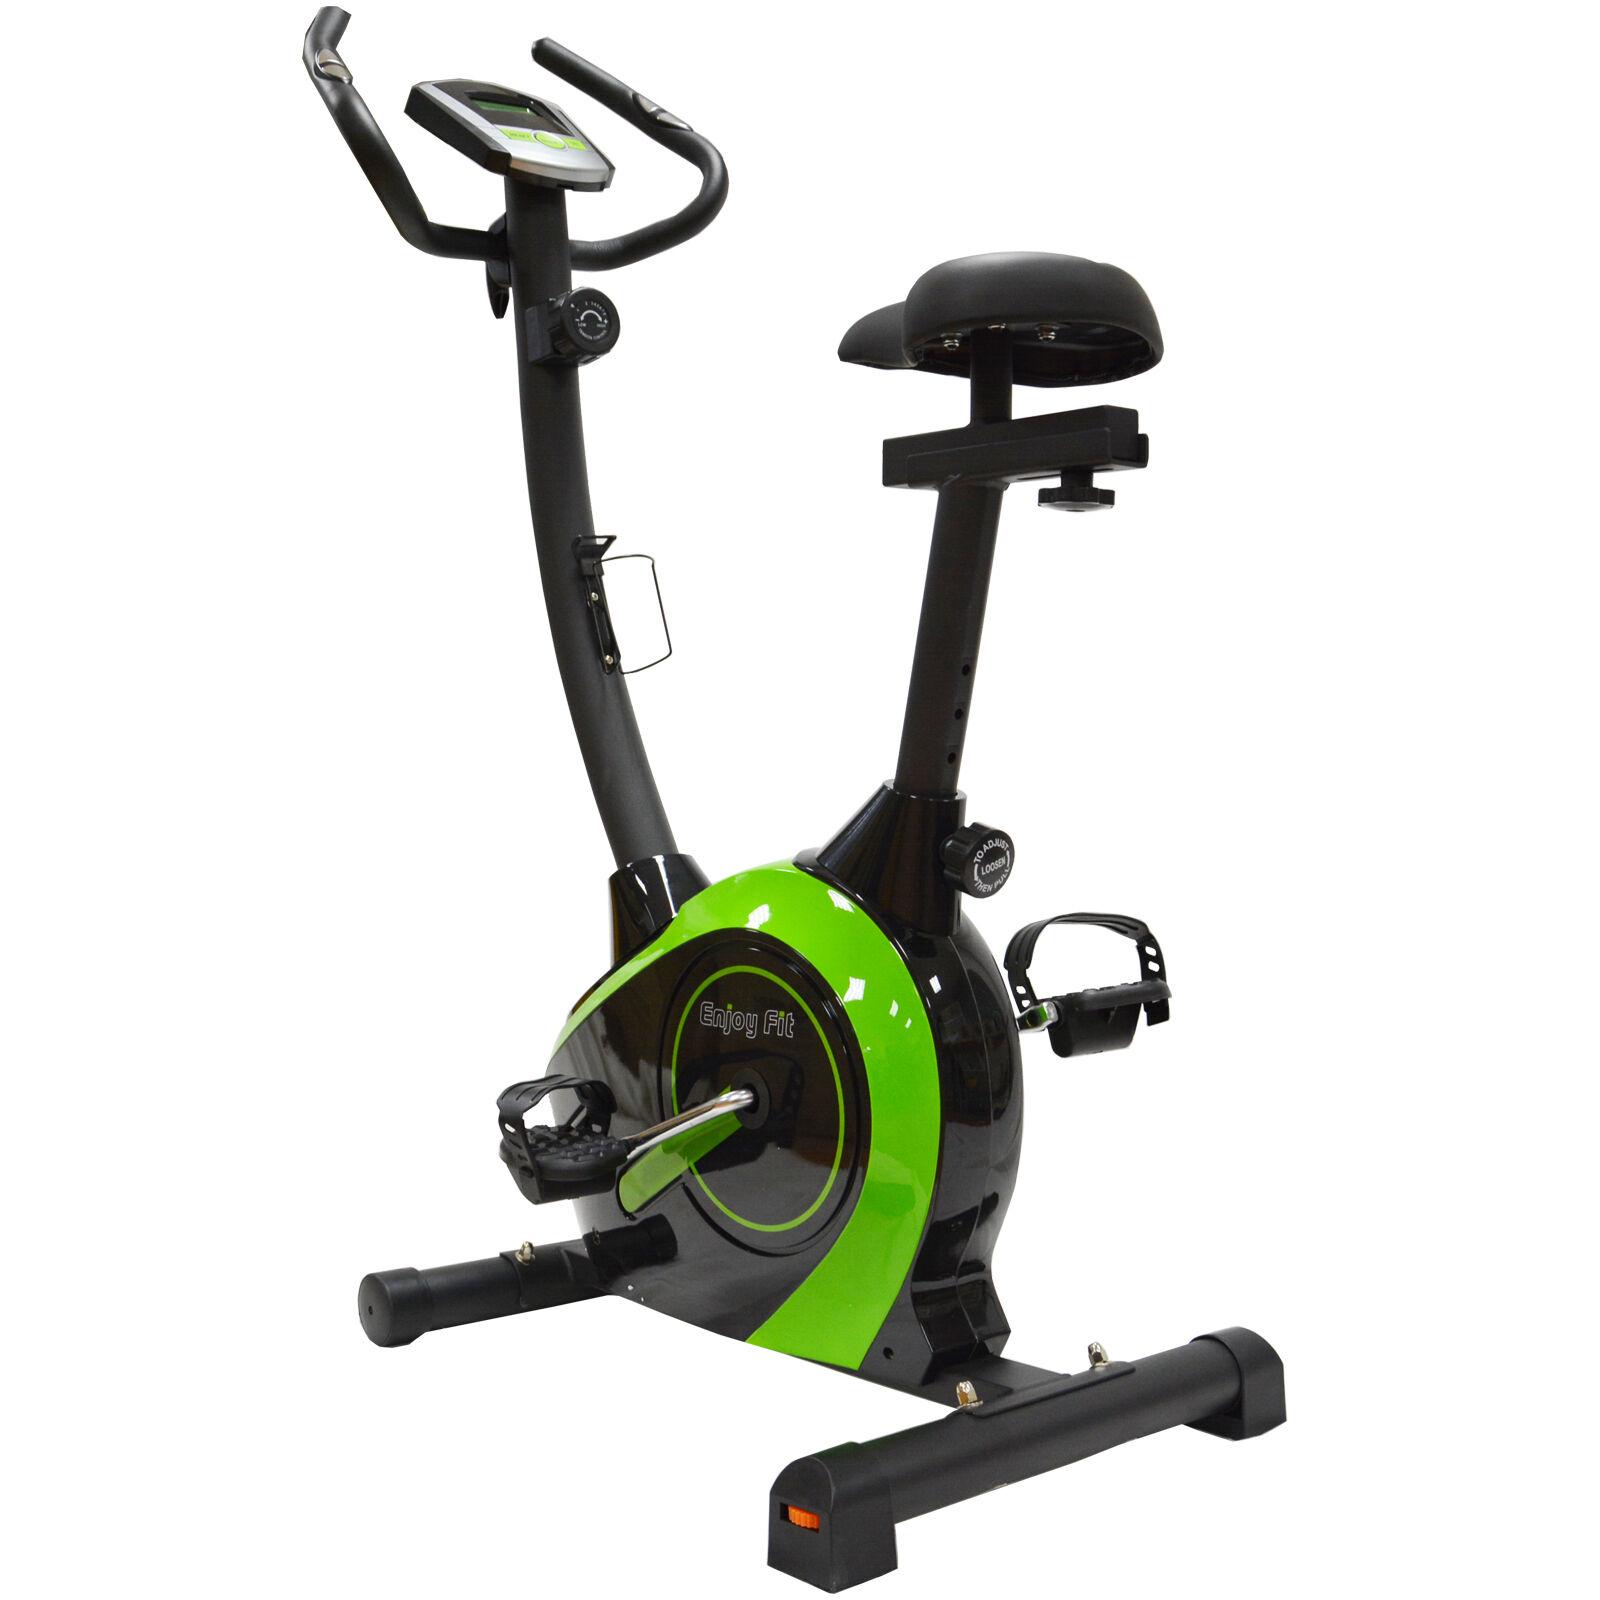 Enjoyfit Home Trainer Ergometer Exercise Bike Trainer with Hand Pulse Sensors